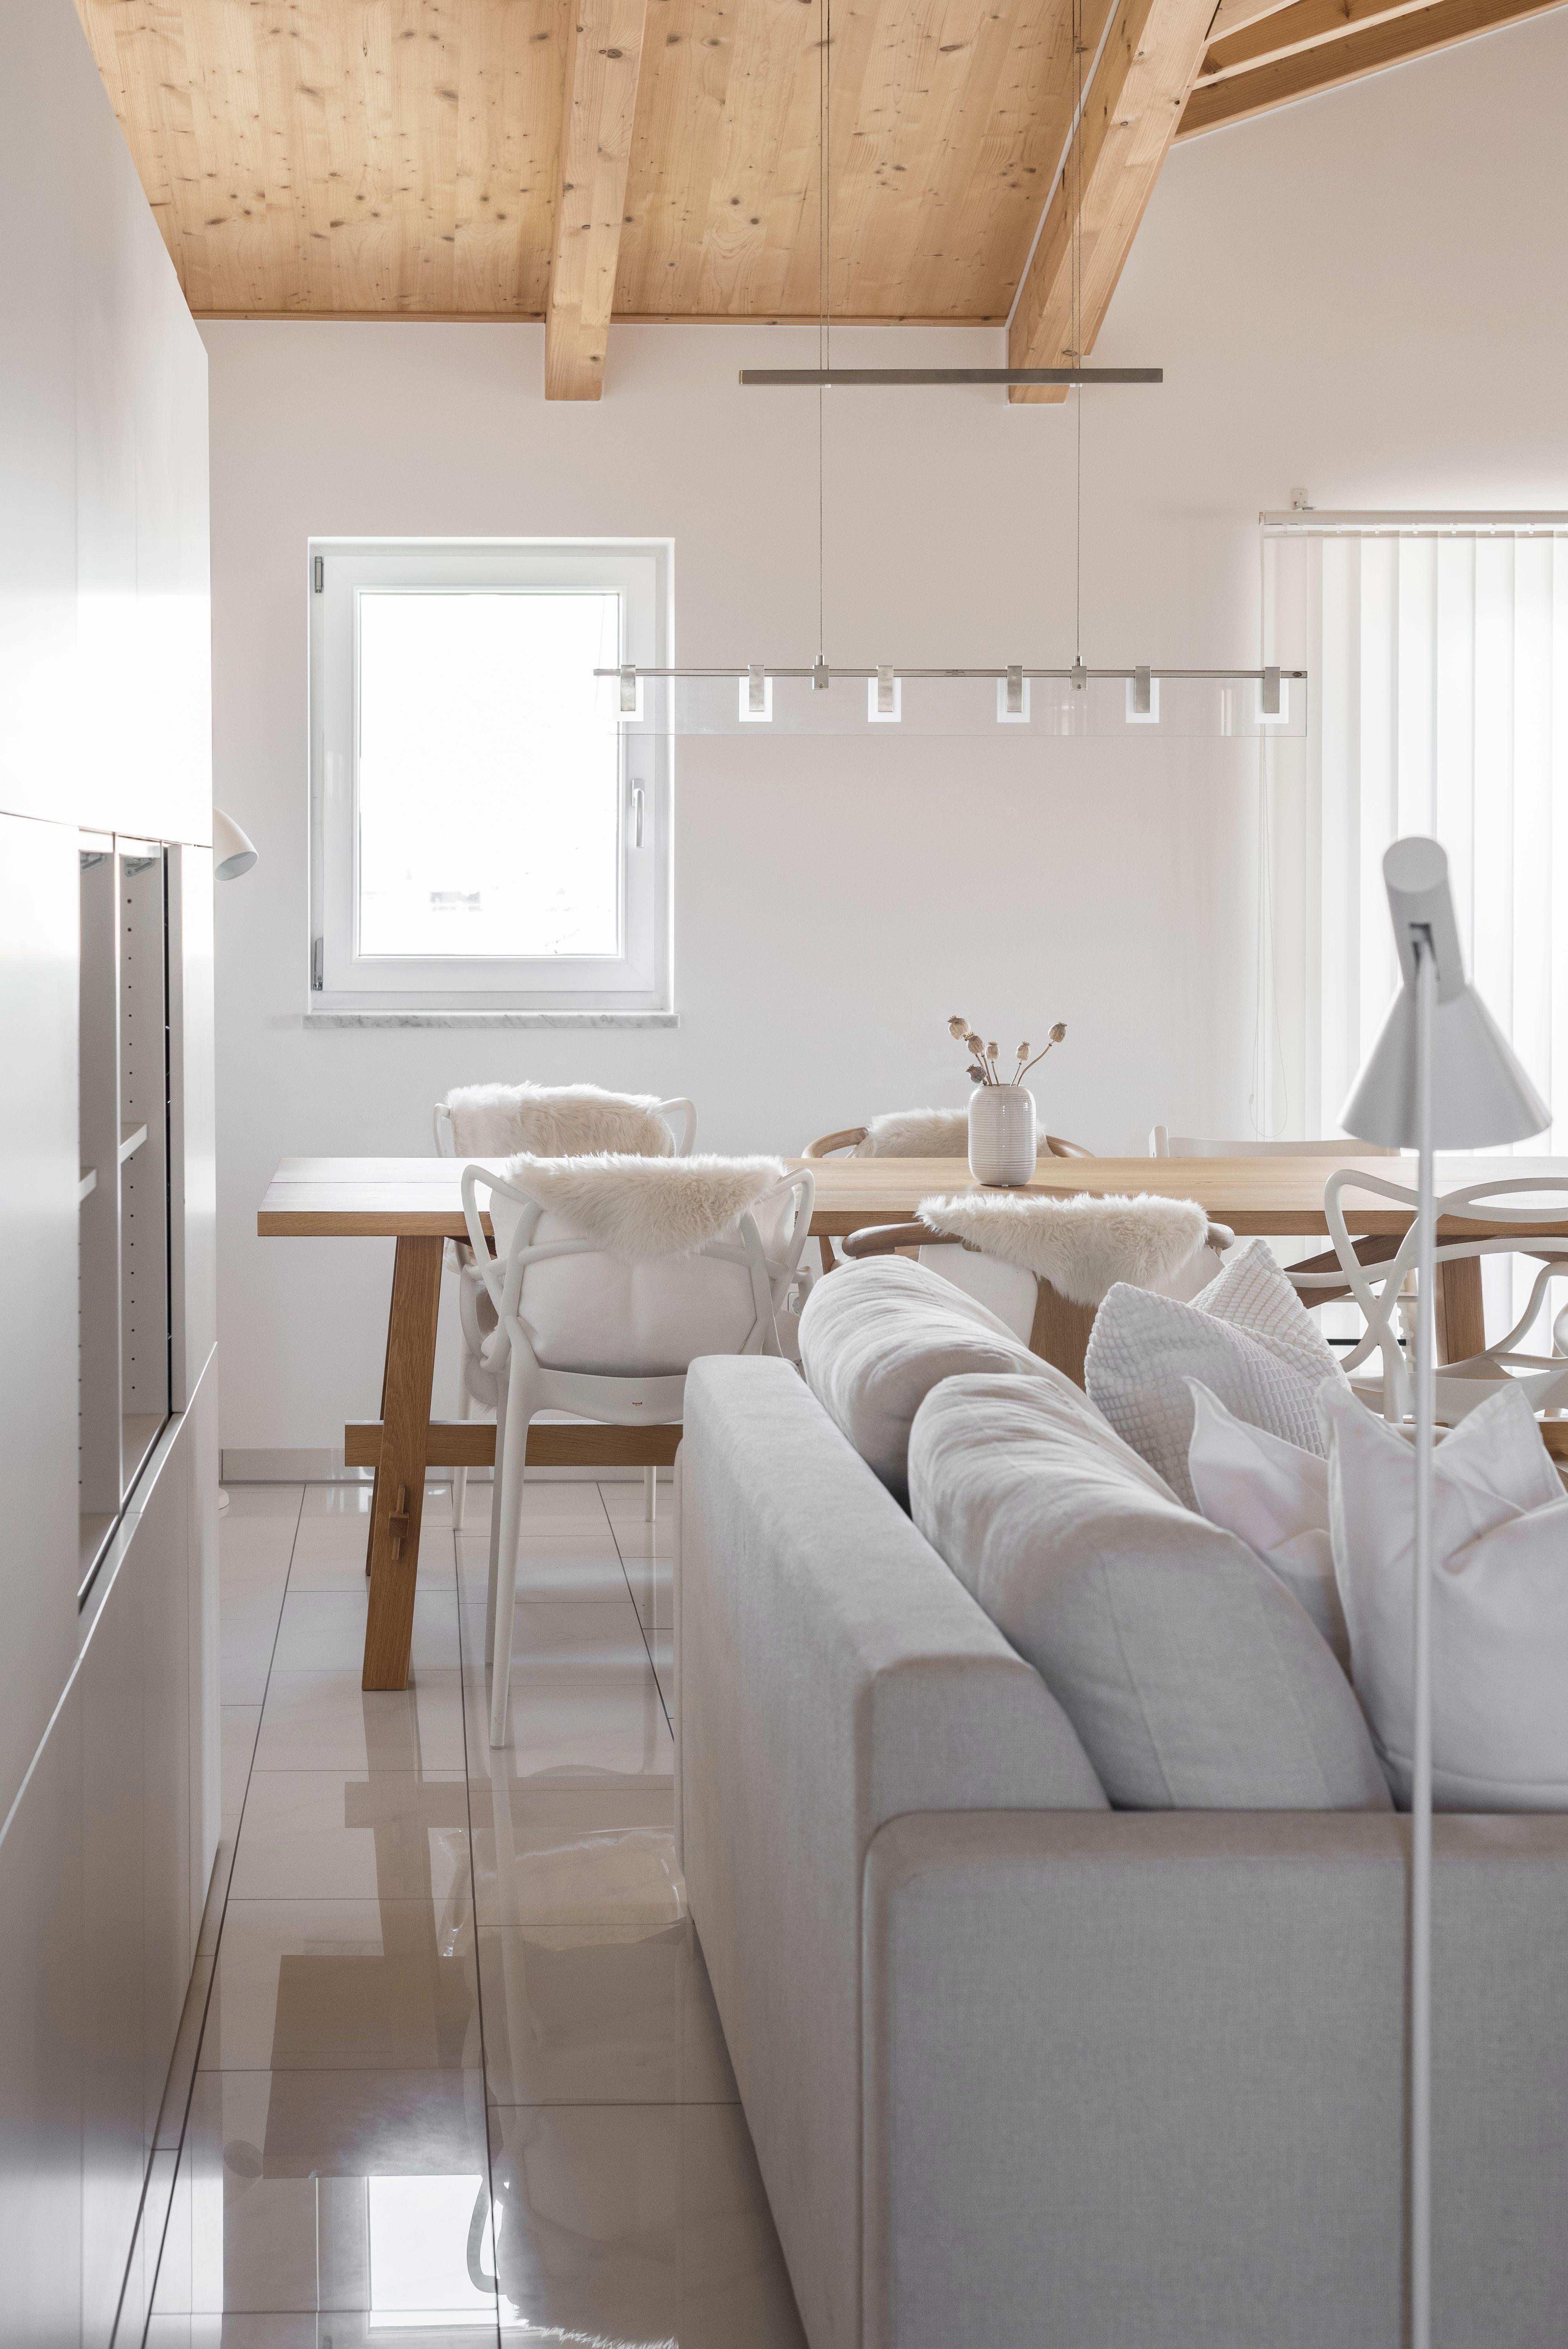 WOHNZIMMER #livingroom #interior #interiordesign #homedecor #whitehome #whiteinterior #minimalsm #home #scandinavian #inspohome #livingroomdecor #decoration #myhome #nordicliving #diningroom